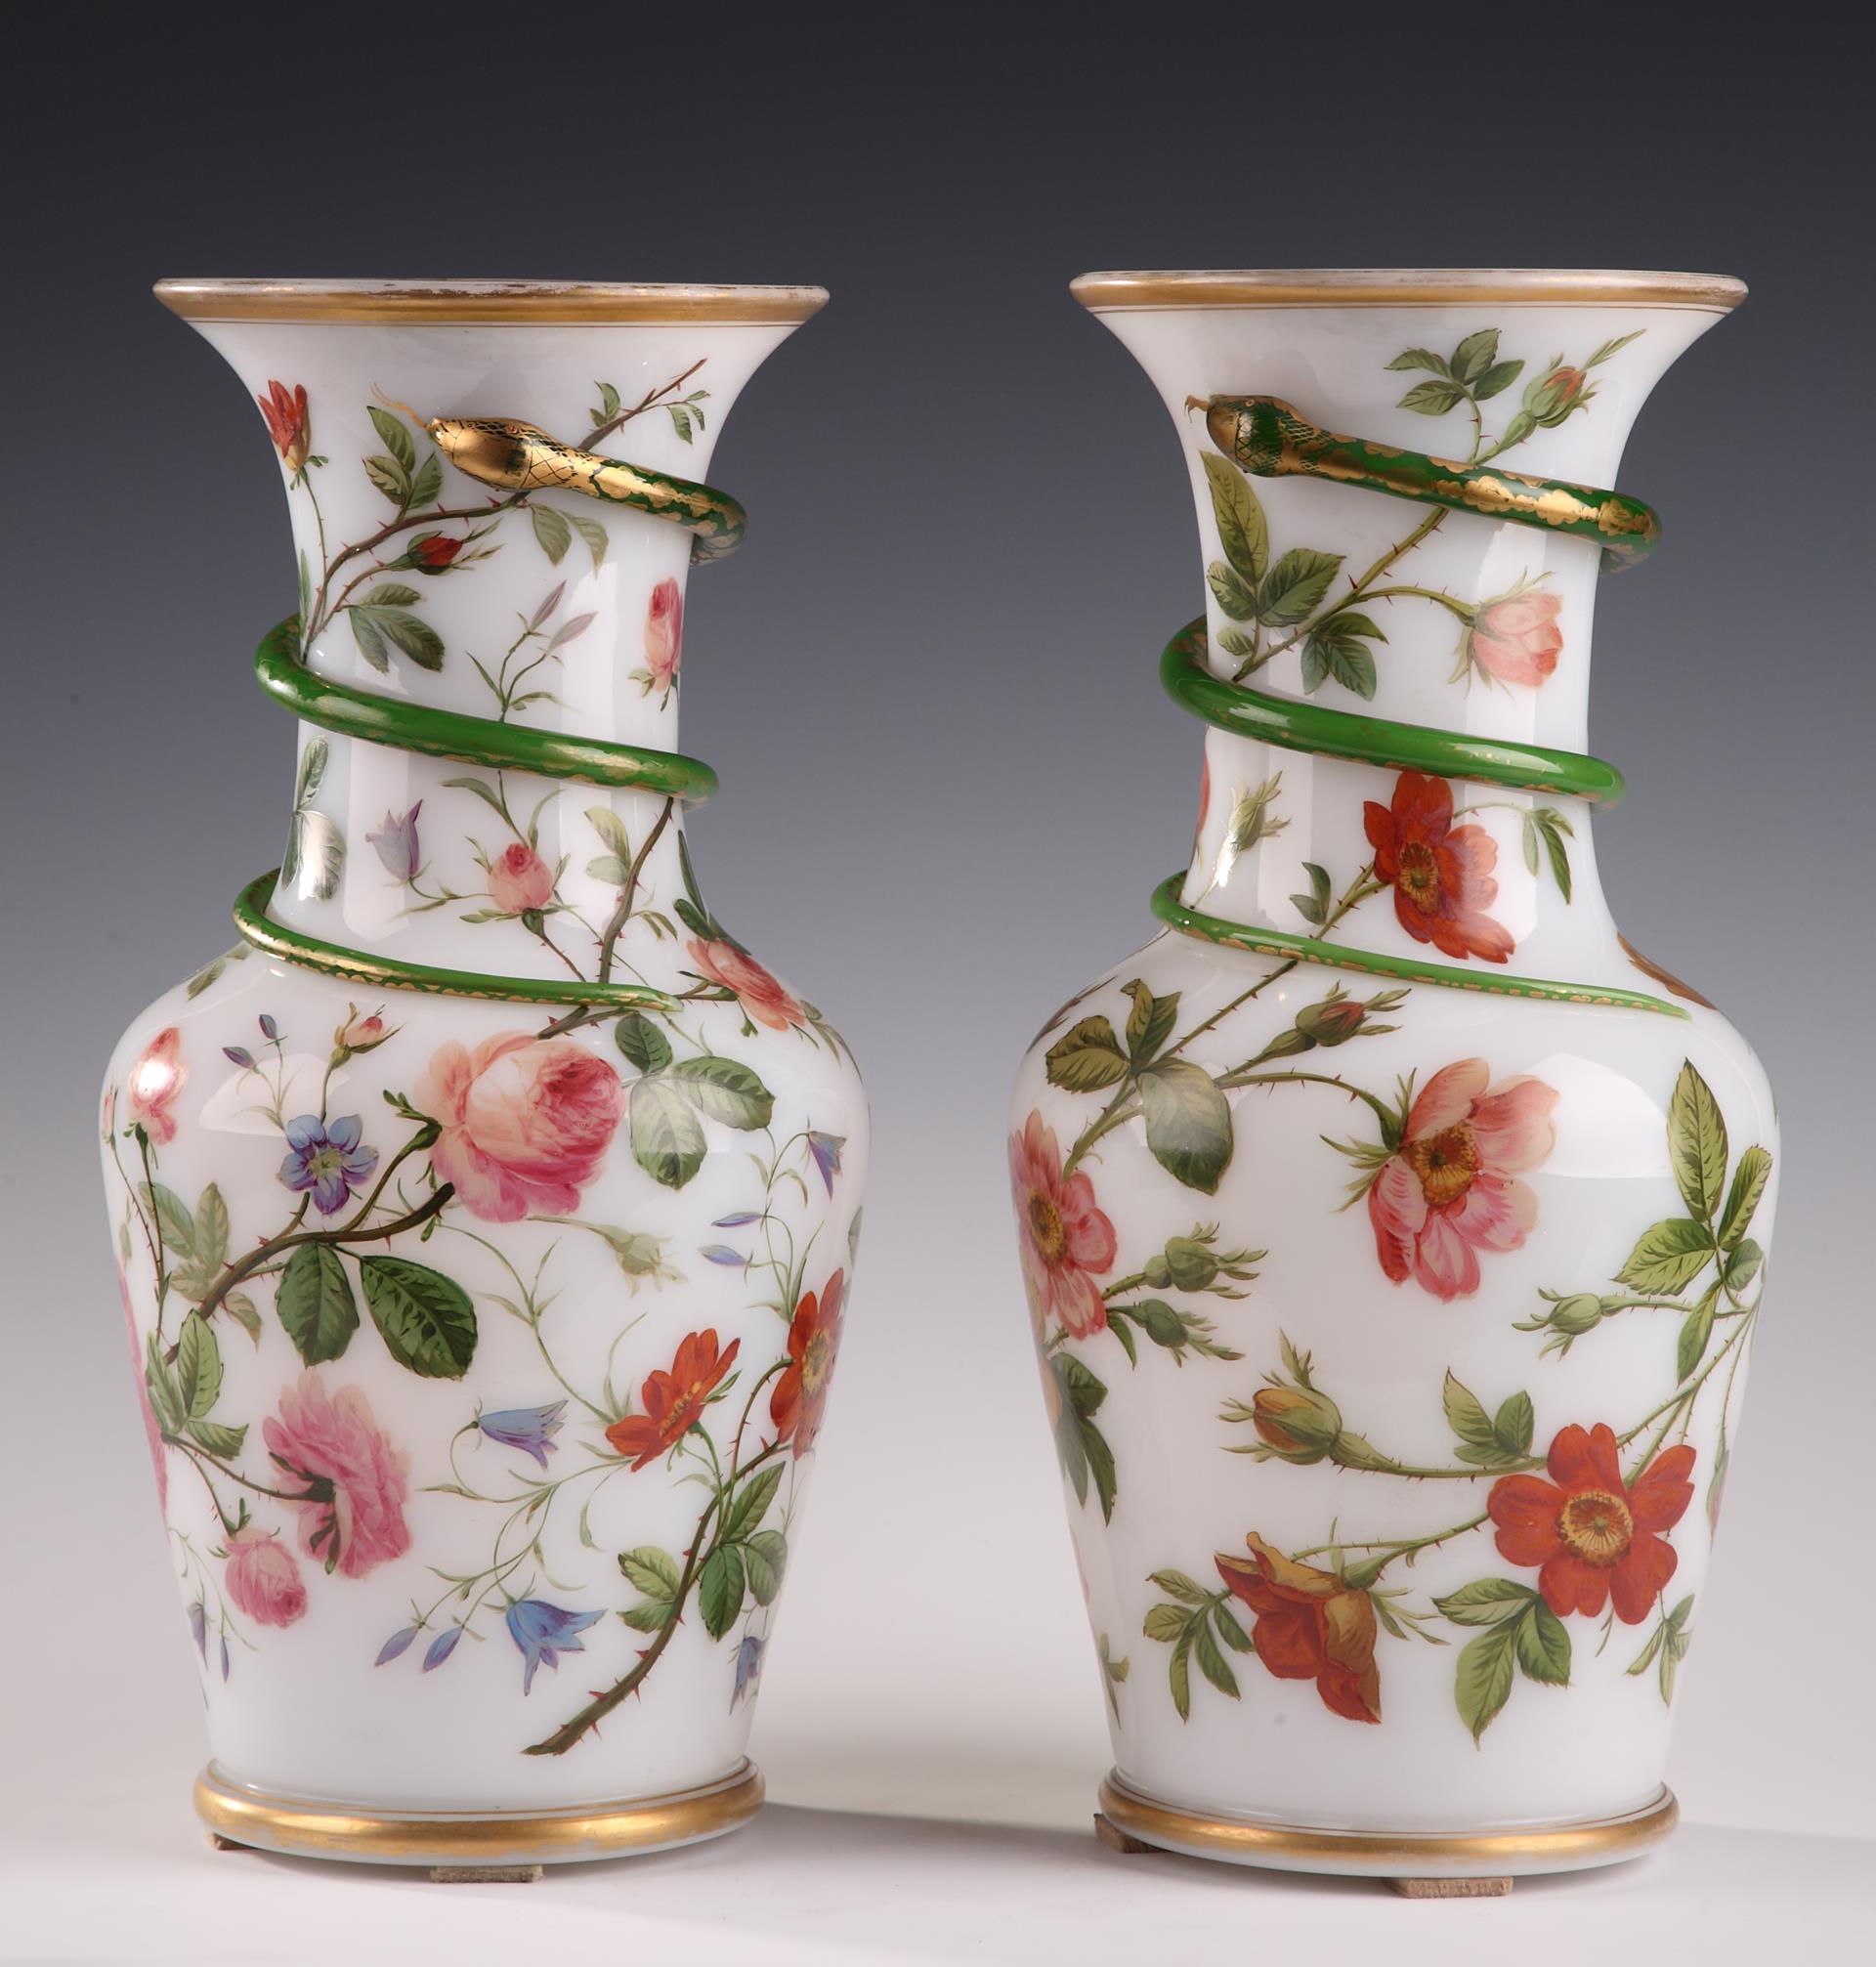 Pair of white opaline vases. Model of J-F Robert.<br/> Circa 1840-1850.